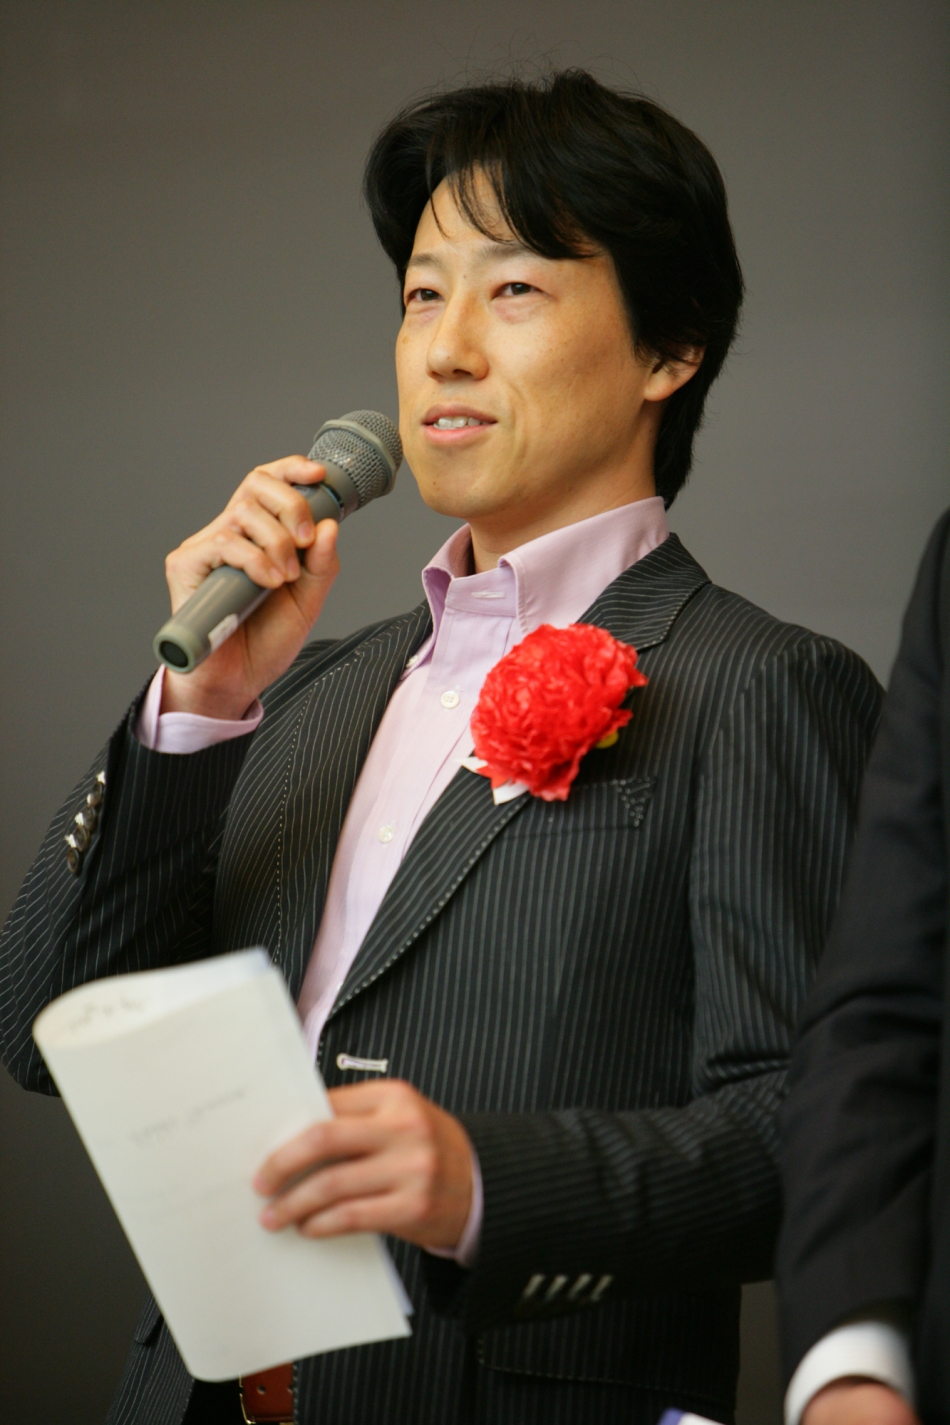 First Place Winner, Naoki Tamura, 2011